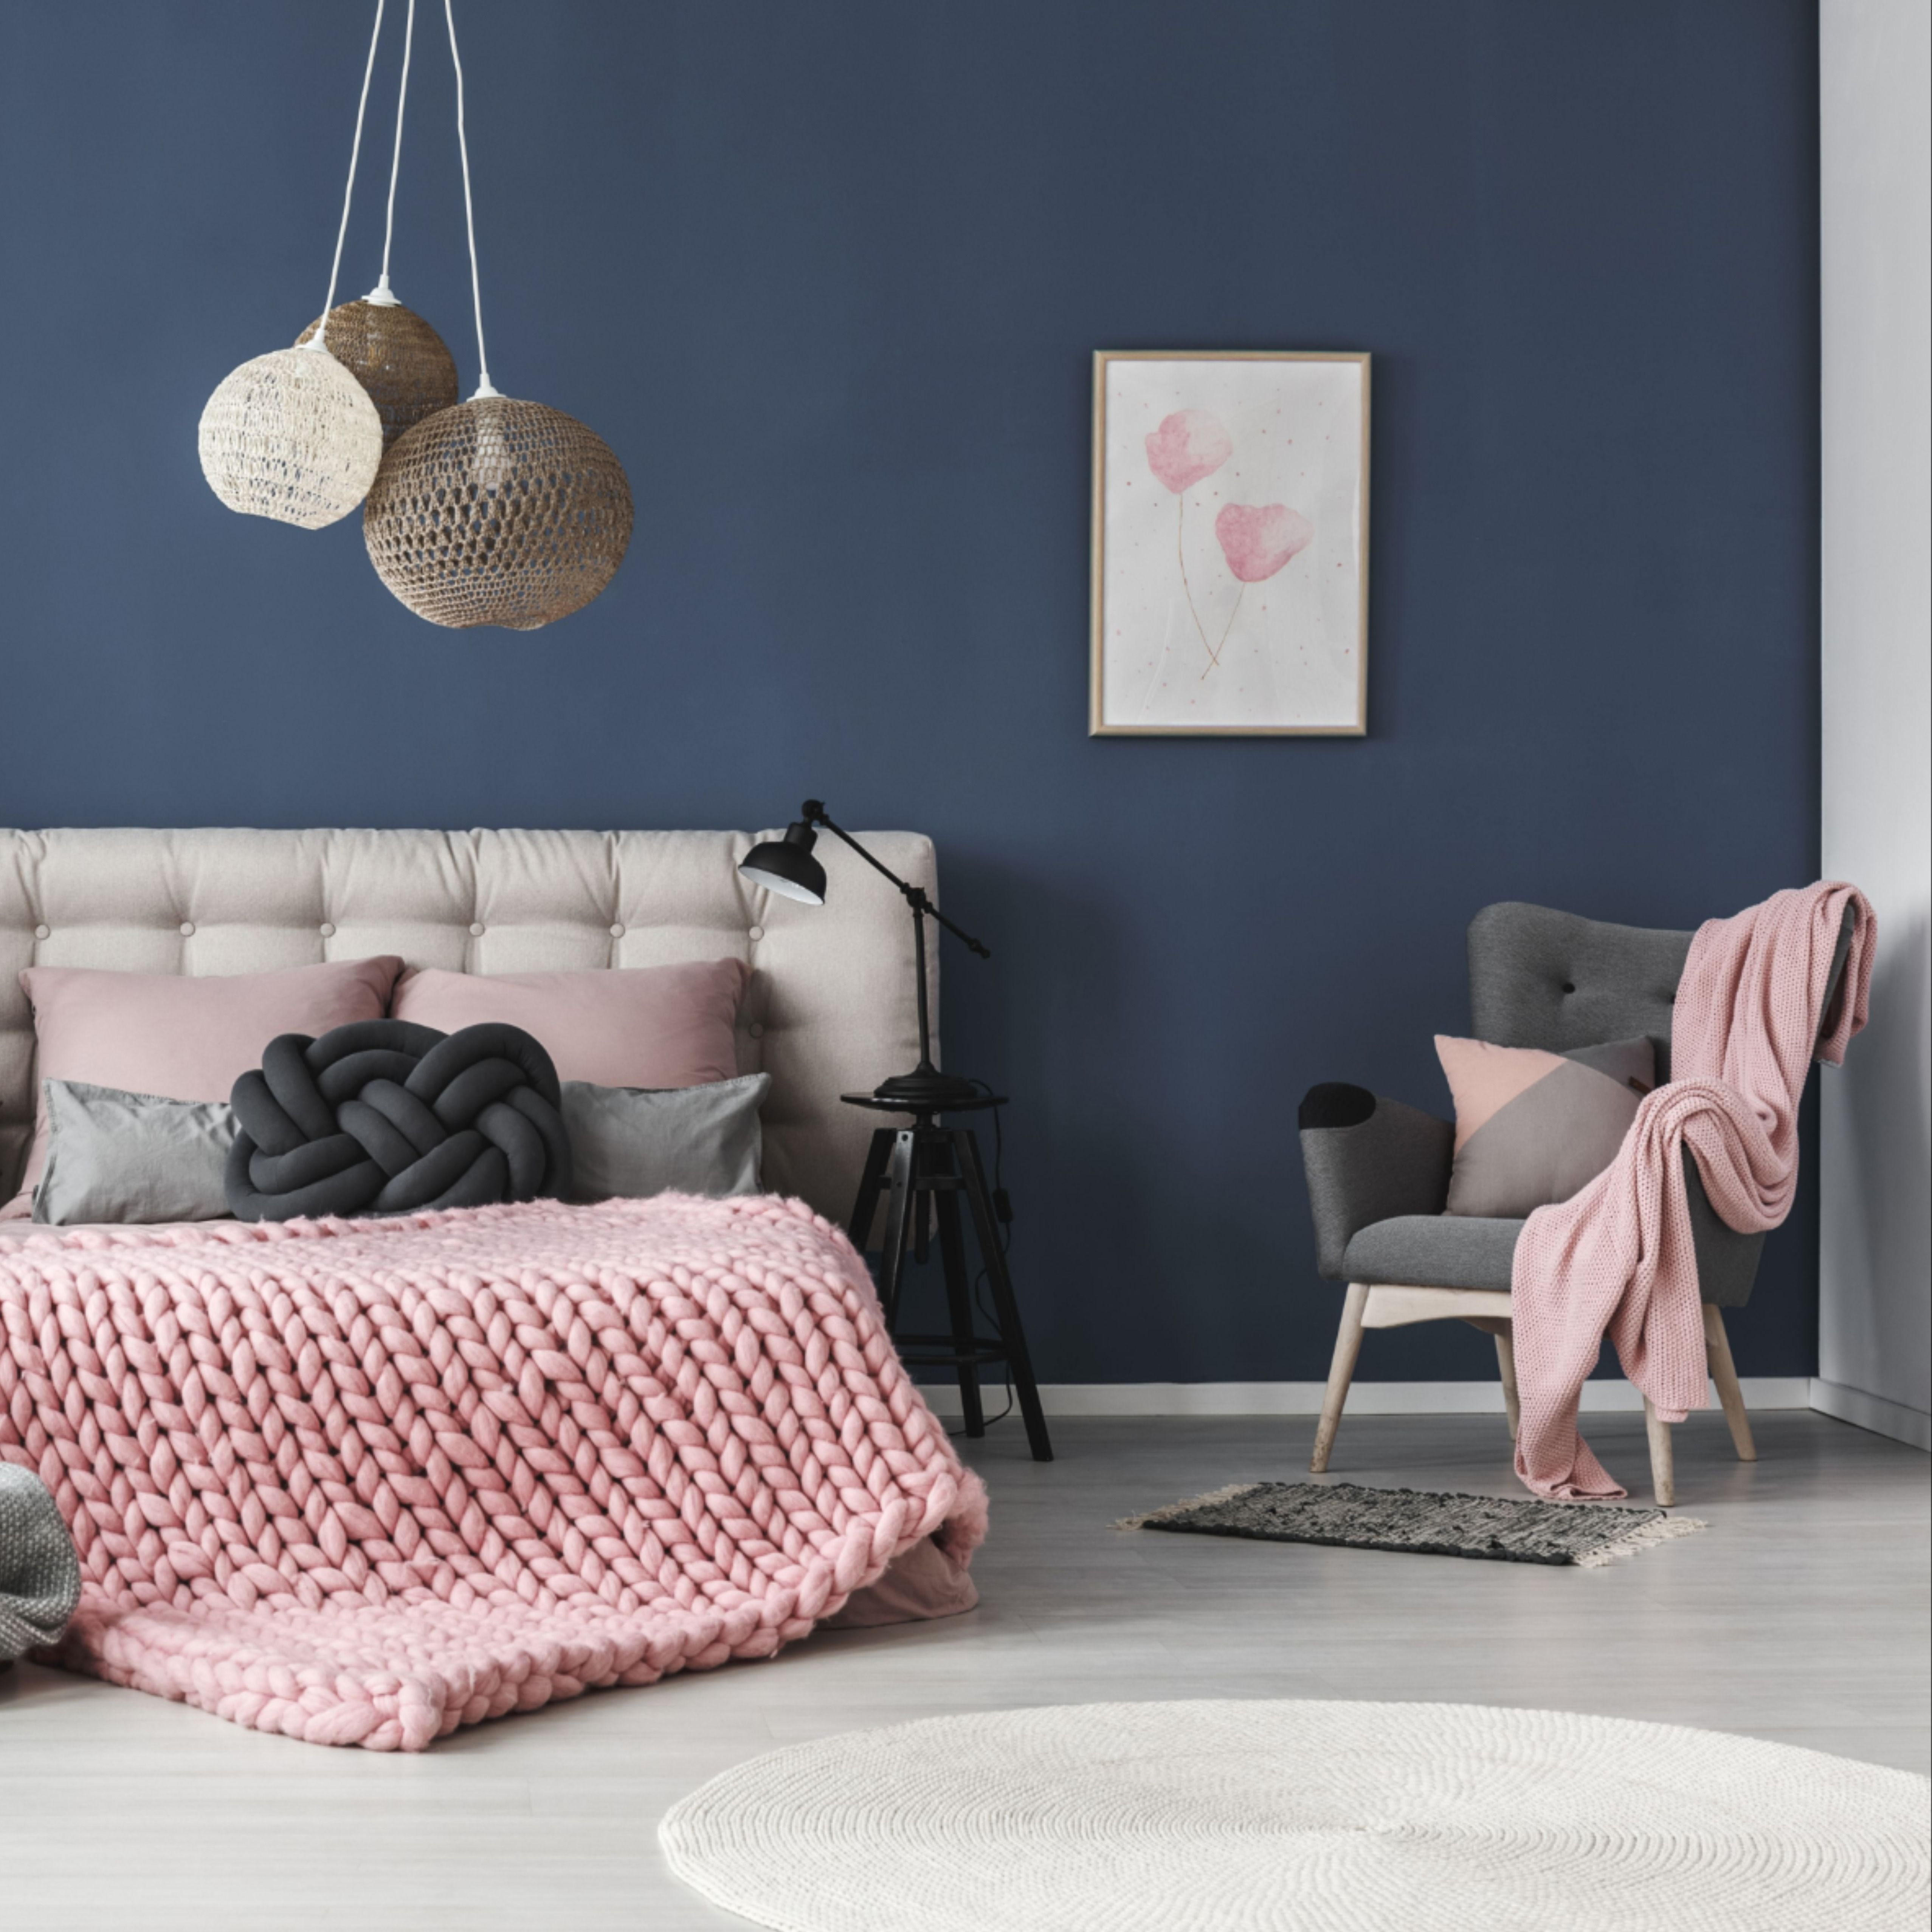 Classic Blue Fur Zuhause Alpina Farbrezepte Blaue Stunde Wandfarbe Wohnzimmer Wandfarbe Wandfarbe Schlafzimmer